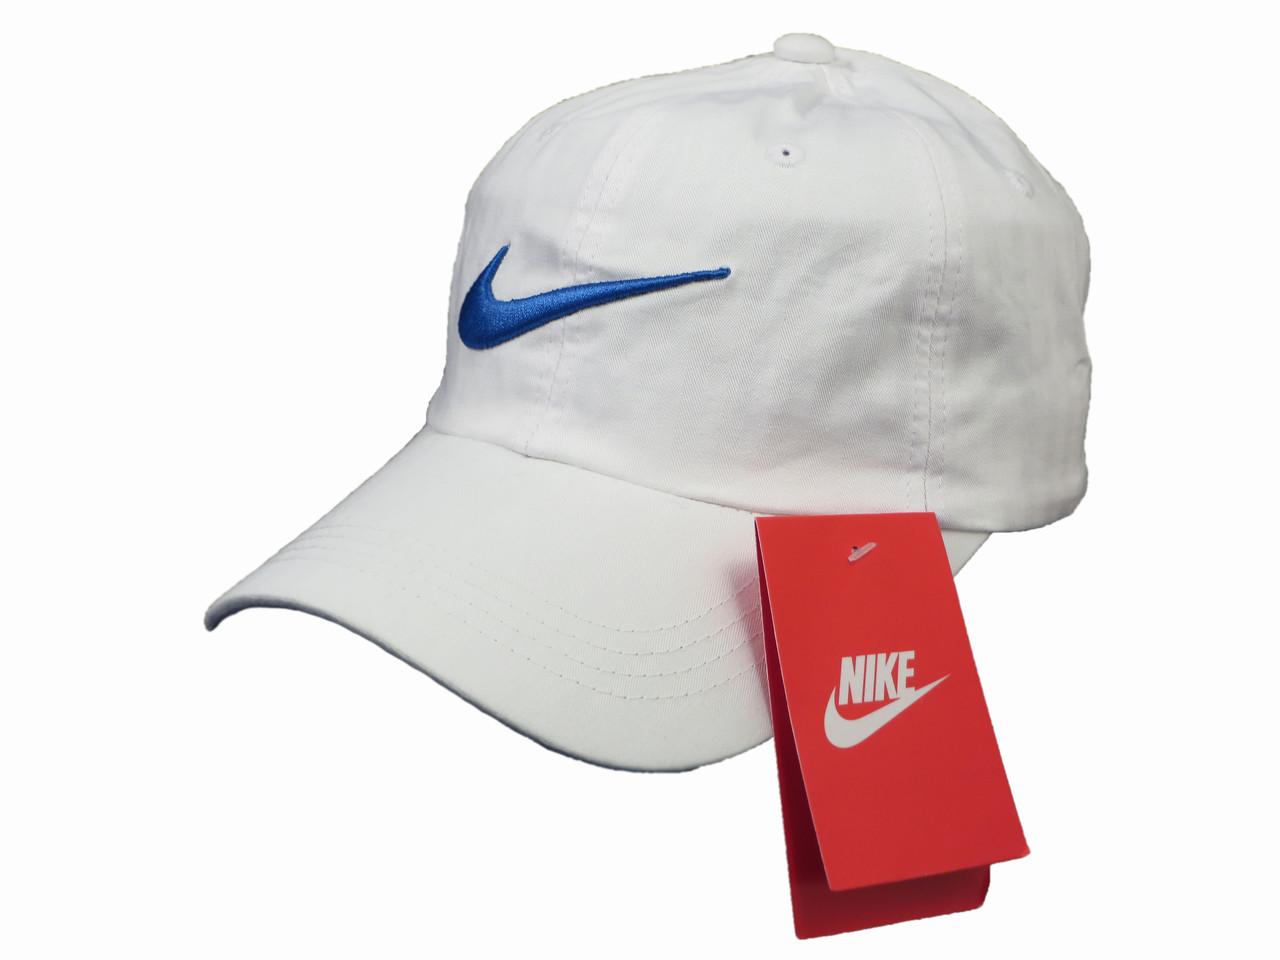 Белая бейсболка Nike с синим логотипом (реплика)